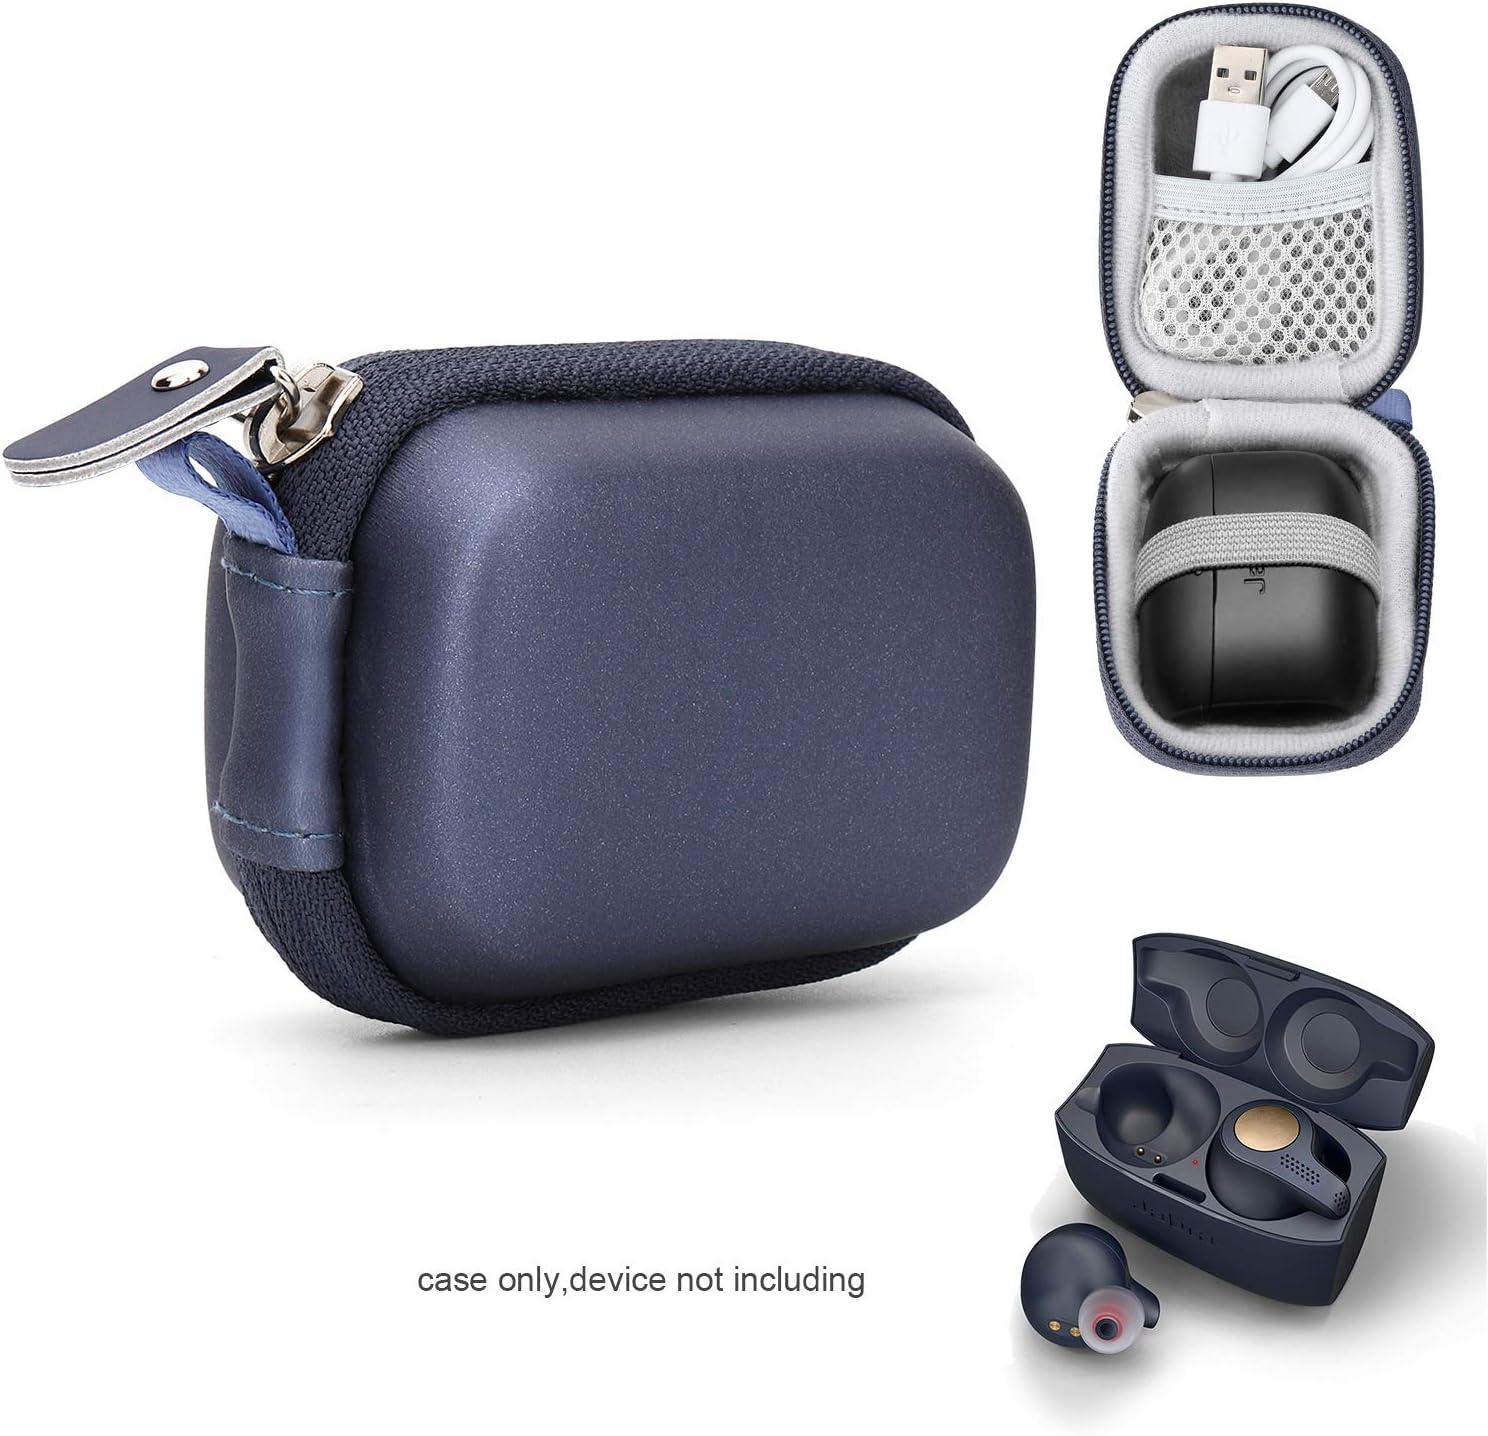 Amazon Com Moonstruck True Wireless Earbuds Case For Jabra Elite 65t Elite Active 65t Elite Sport True Wireless Earbuds Mesh Pocket For Cable And Elastic Secure Strap Easy To Carabiner Blue